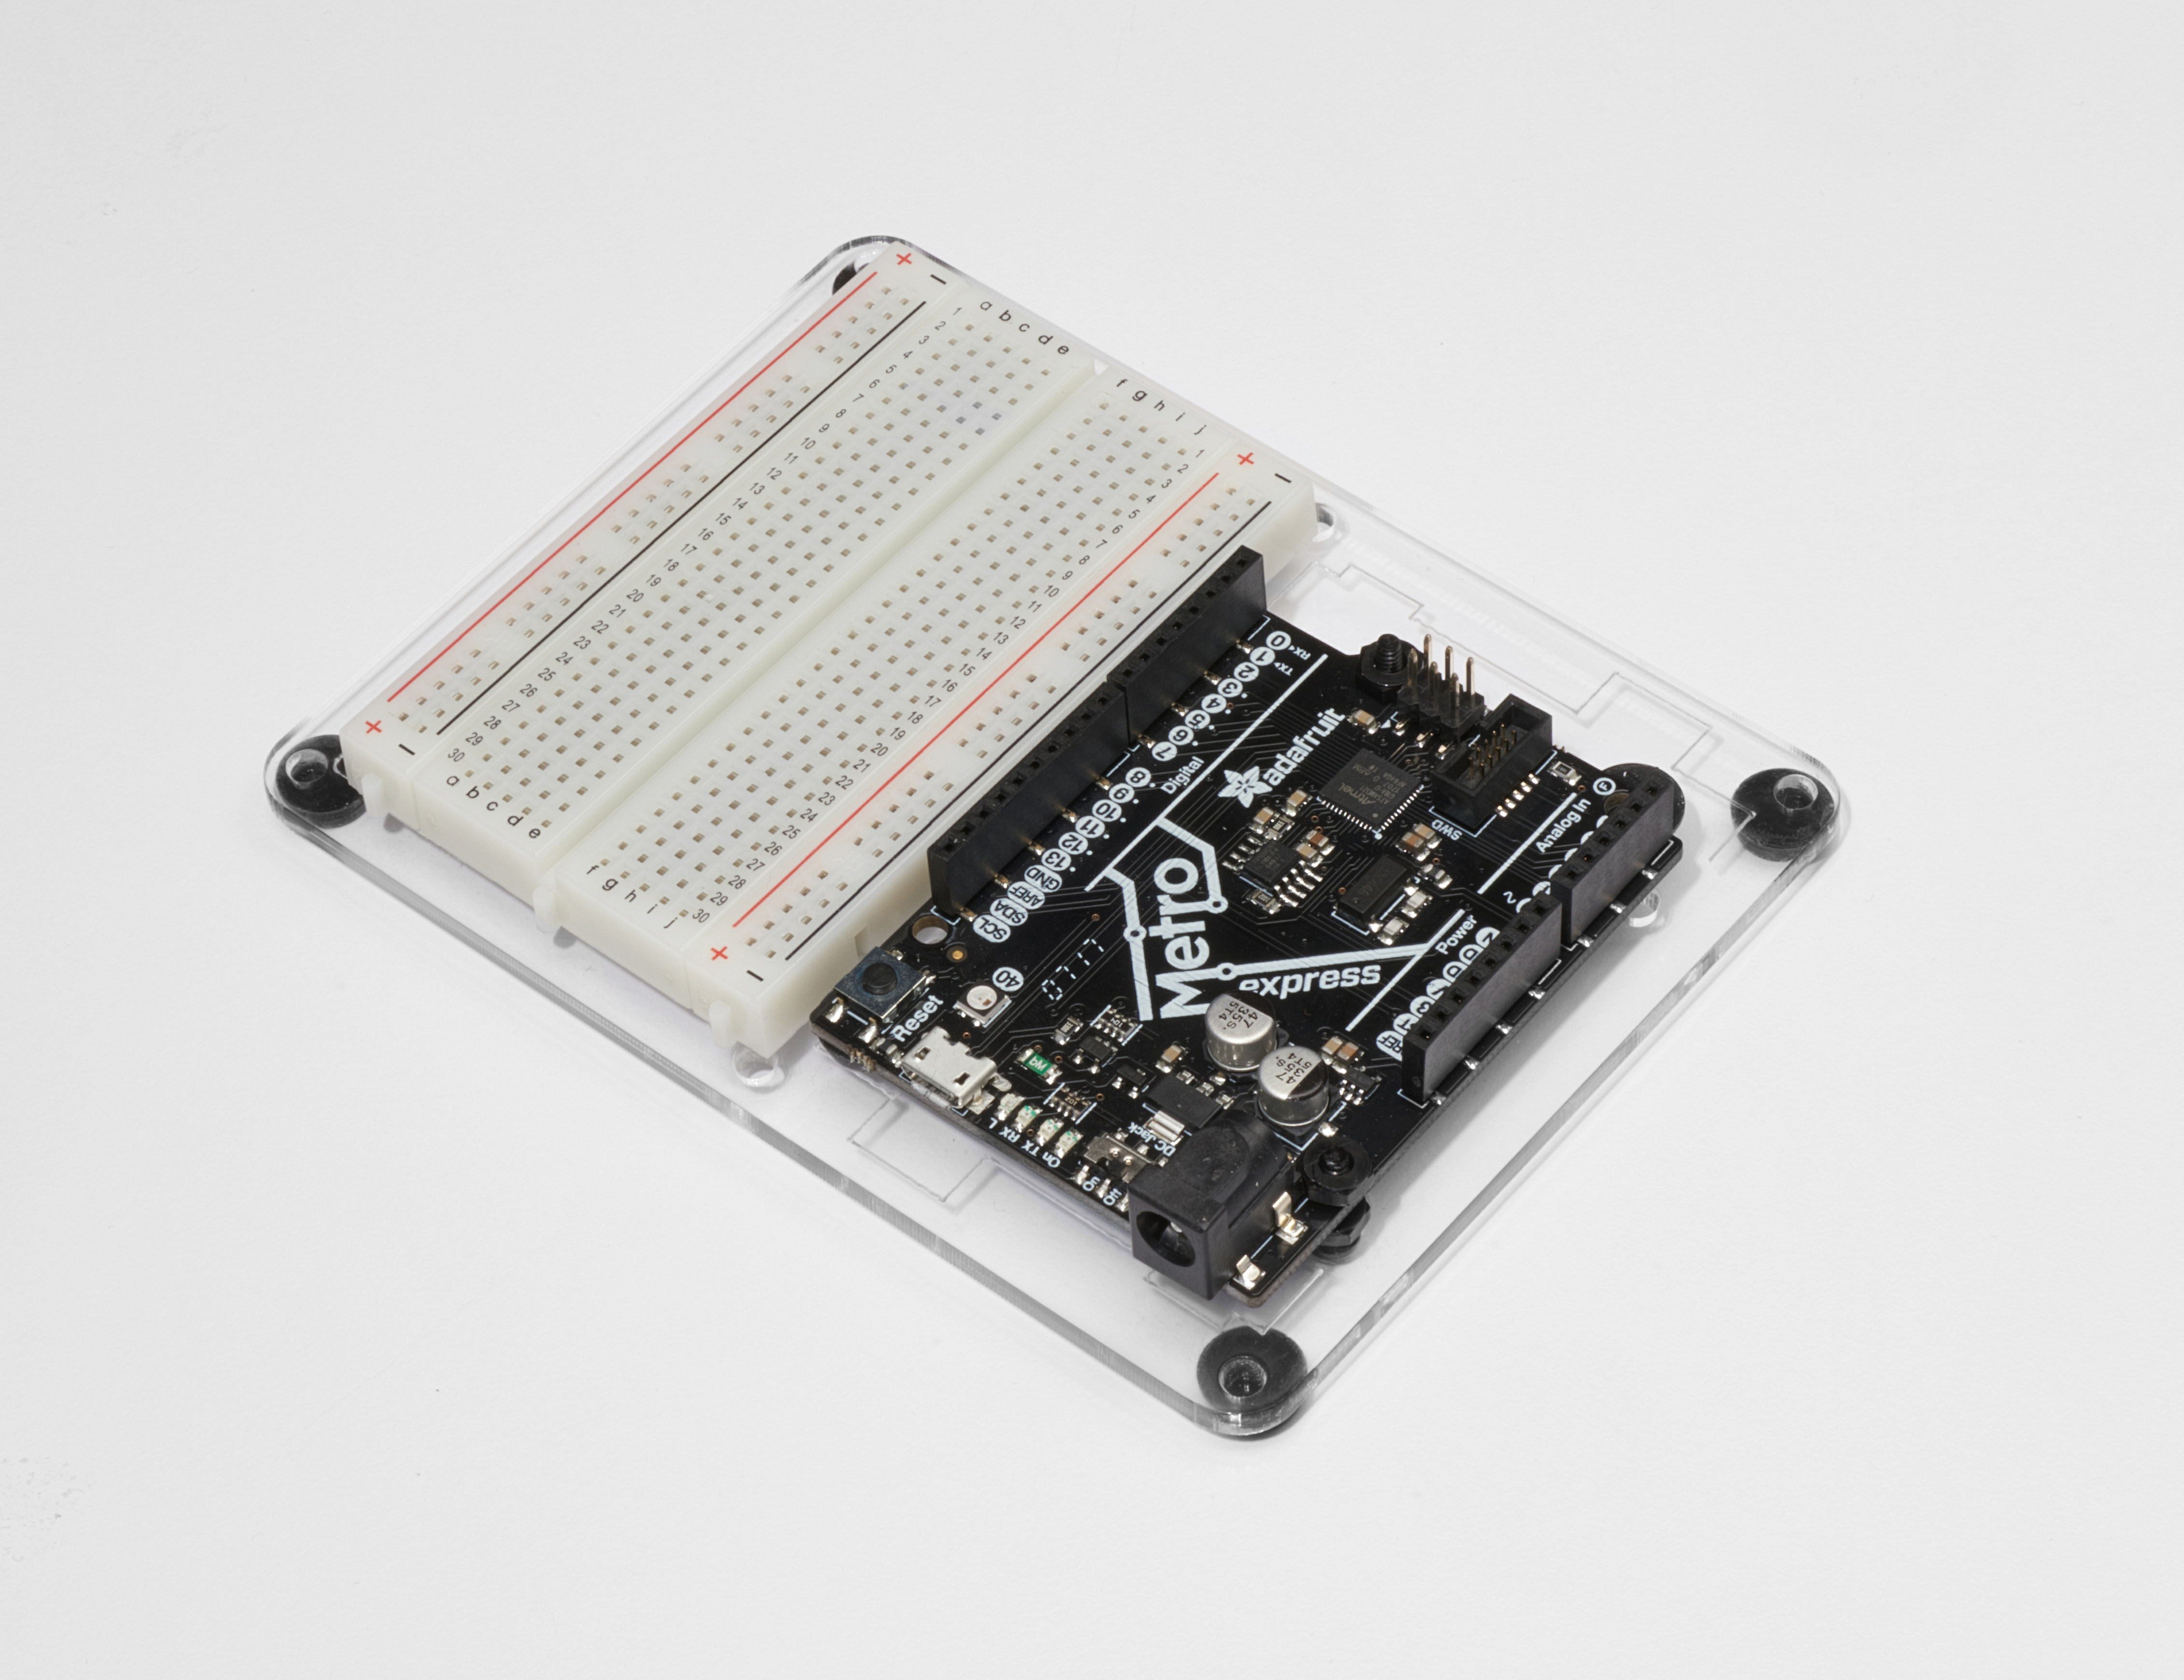 sensors_Metro_Breadboard_Routing_Plate_RedoWhite_Background.jpg